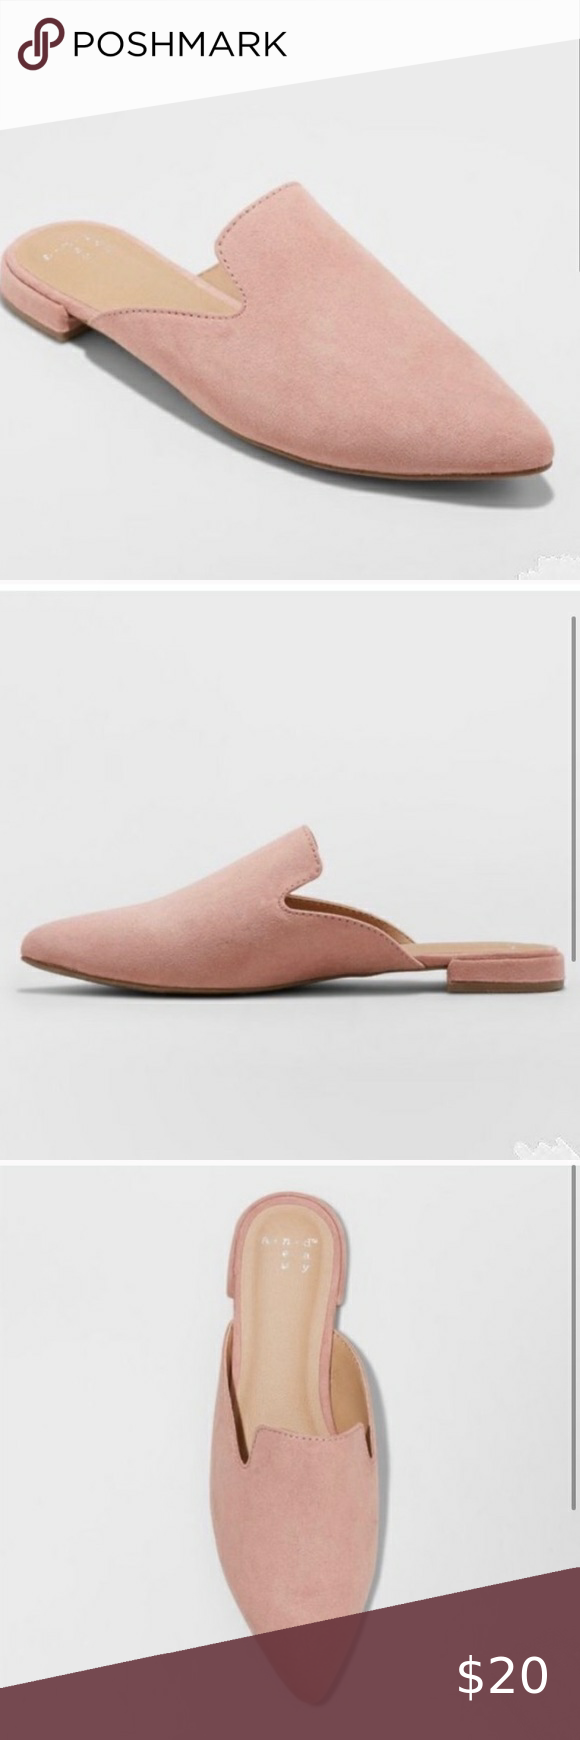 Day Womens Velma Mules Shoes Flats Slip